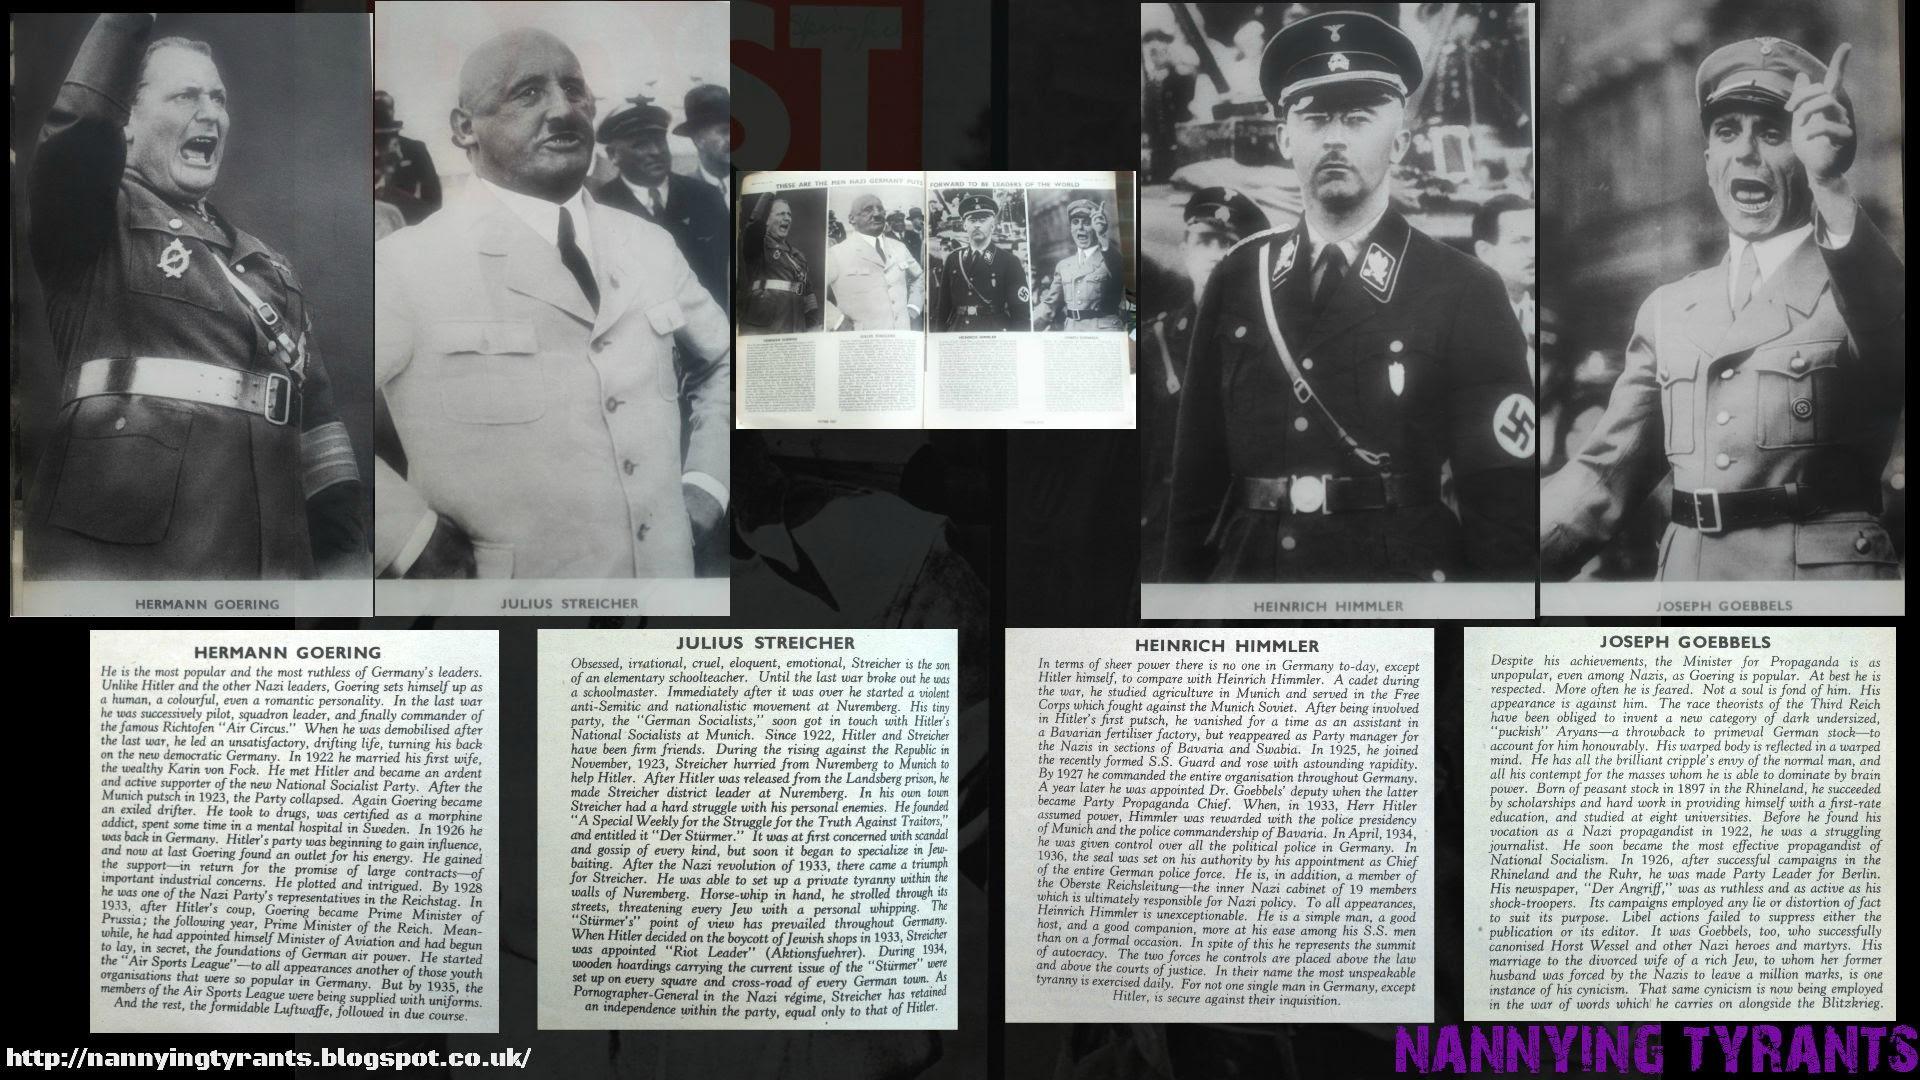 What We Once Fought Against - Nazis: Hermann Goering, Julius Streicher, Heinrich Himmer, and Joseph Goebbels